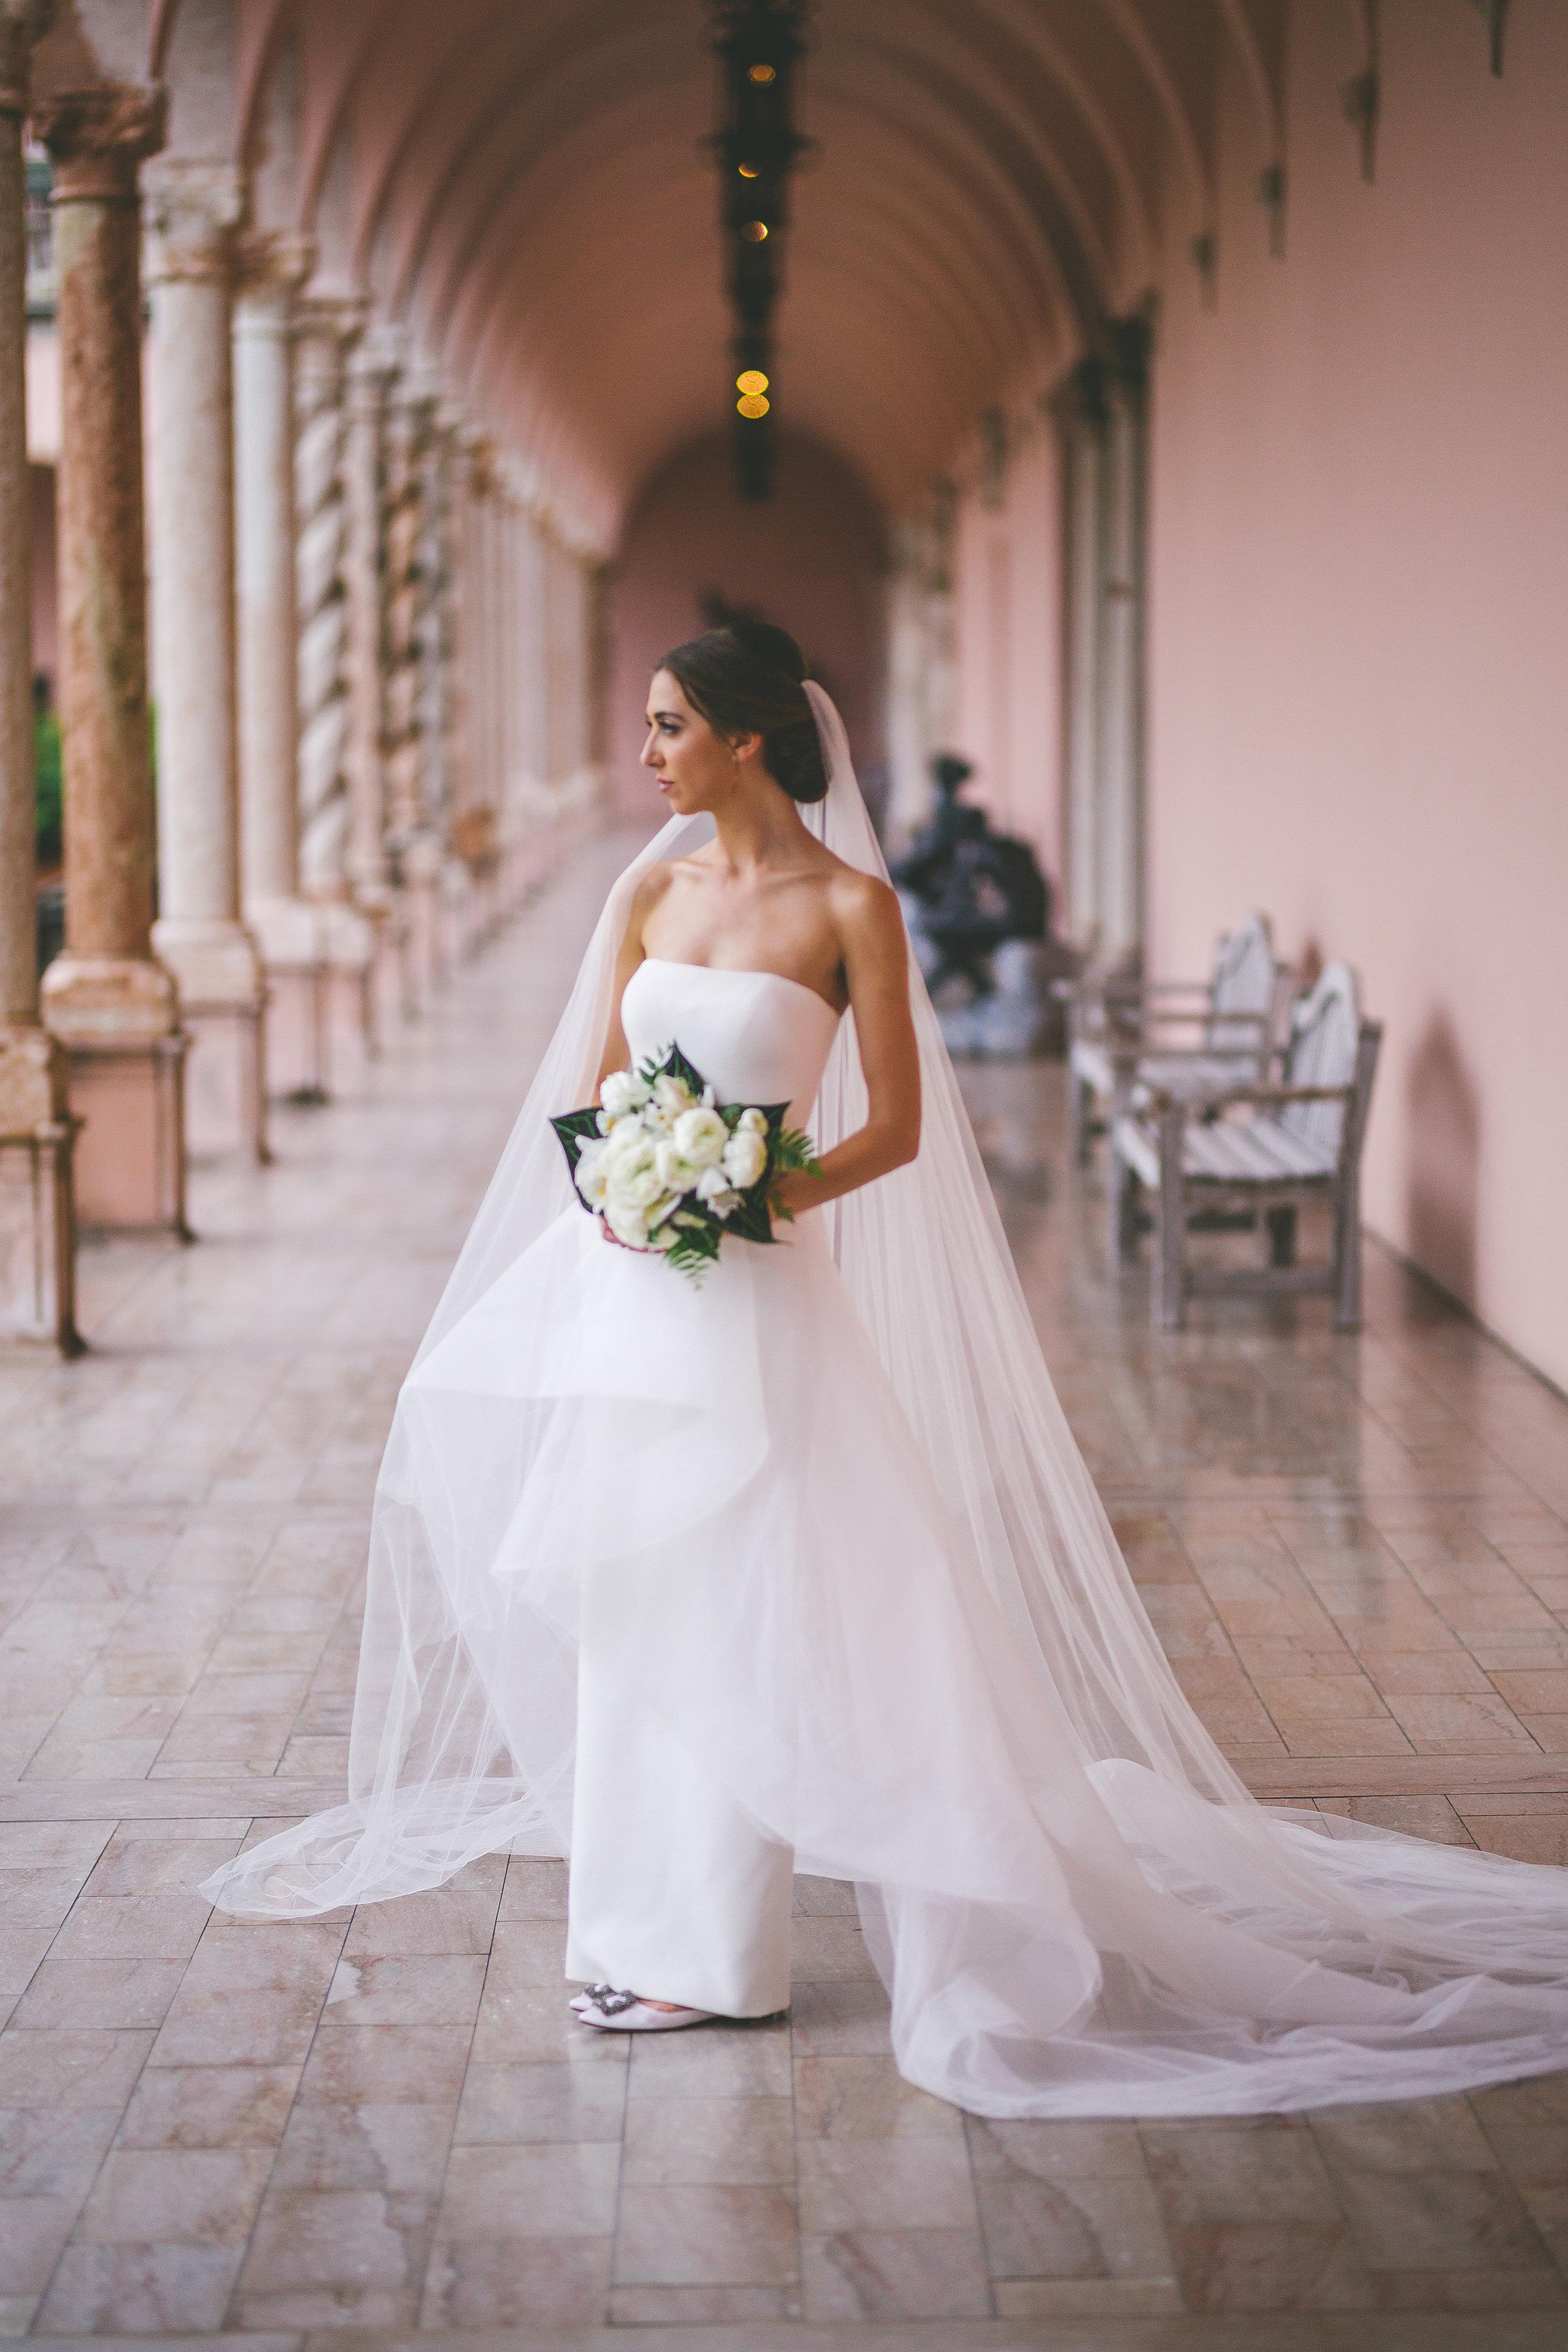 HighlightStudios-WeddingPhotographer-CourtneyandRob-726.jpg